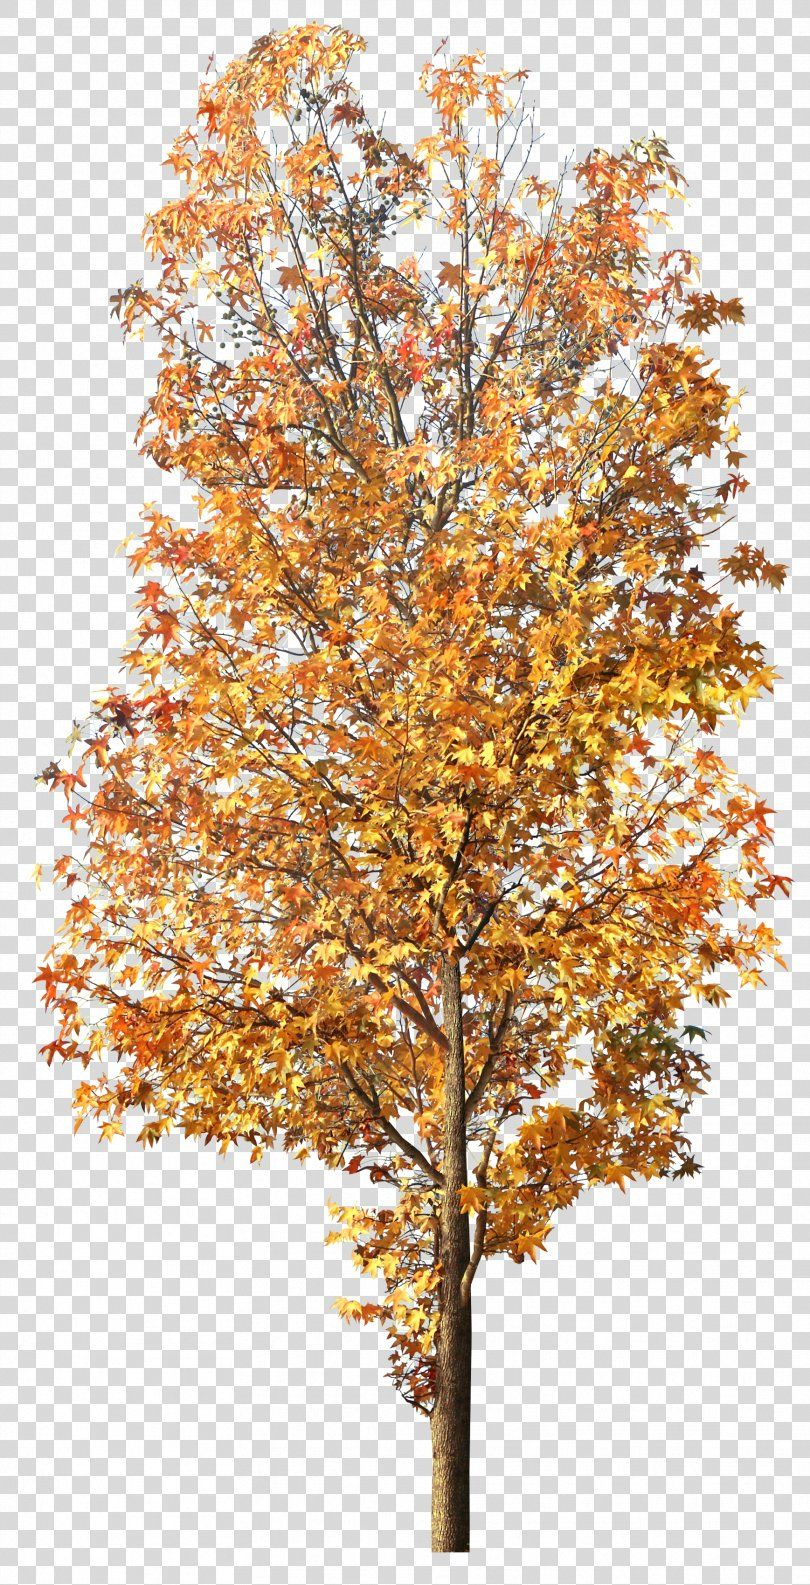 Tree Clip Art Tree Png Tree Autumn Blog Branch Deciduous Png Clip Art Autumn Trees